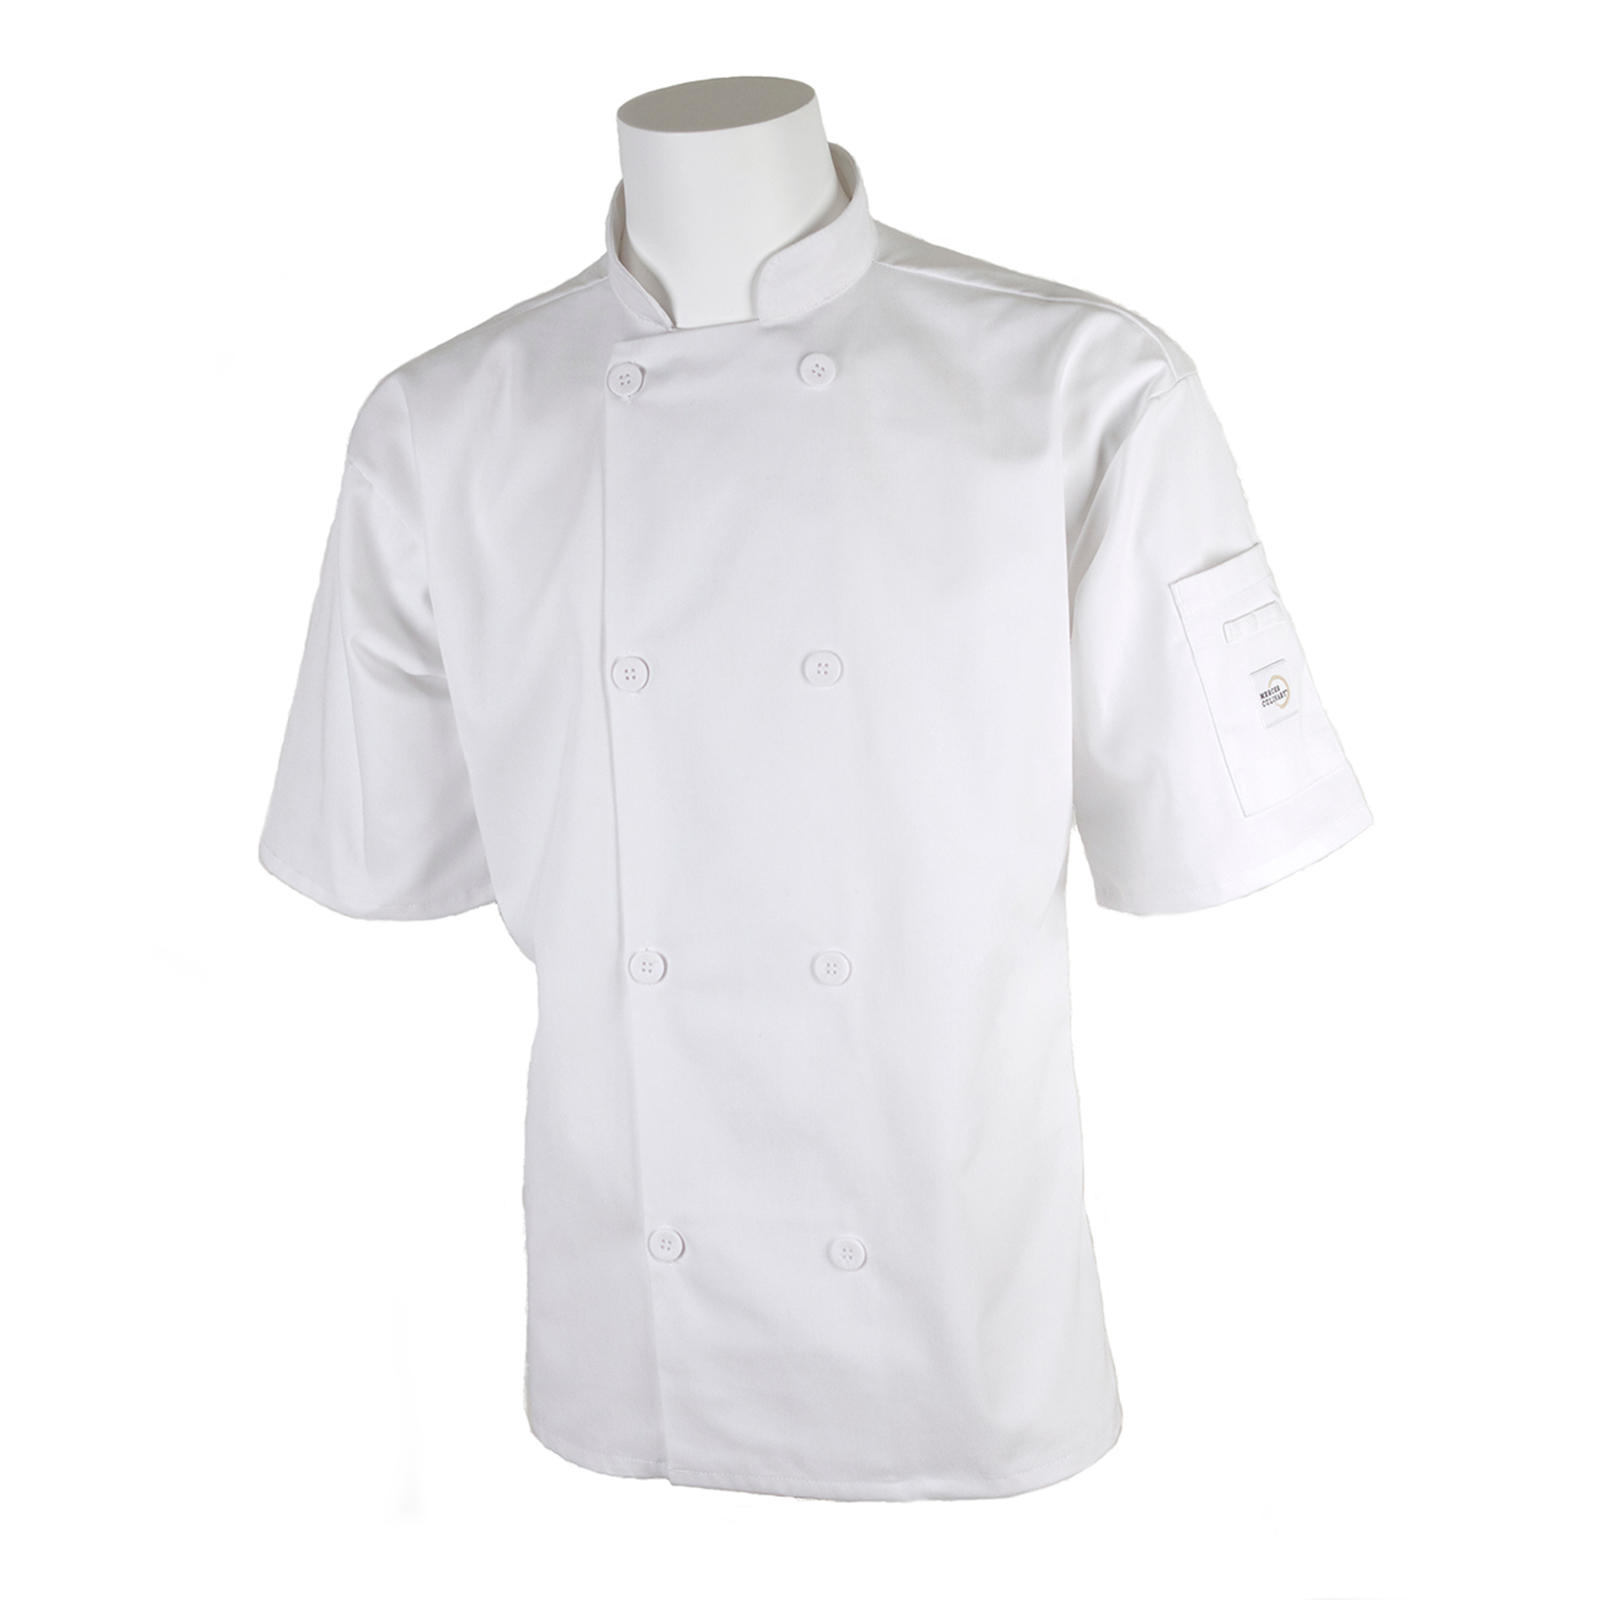 Mercer Culinary M60013WH8X chef's coat